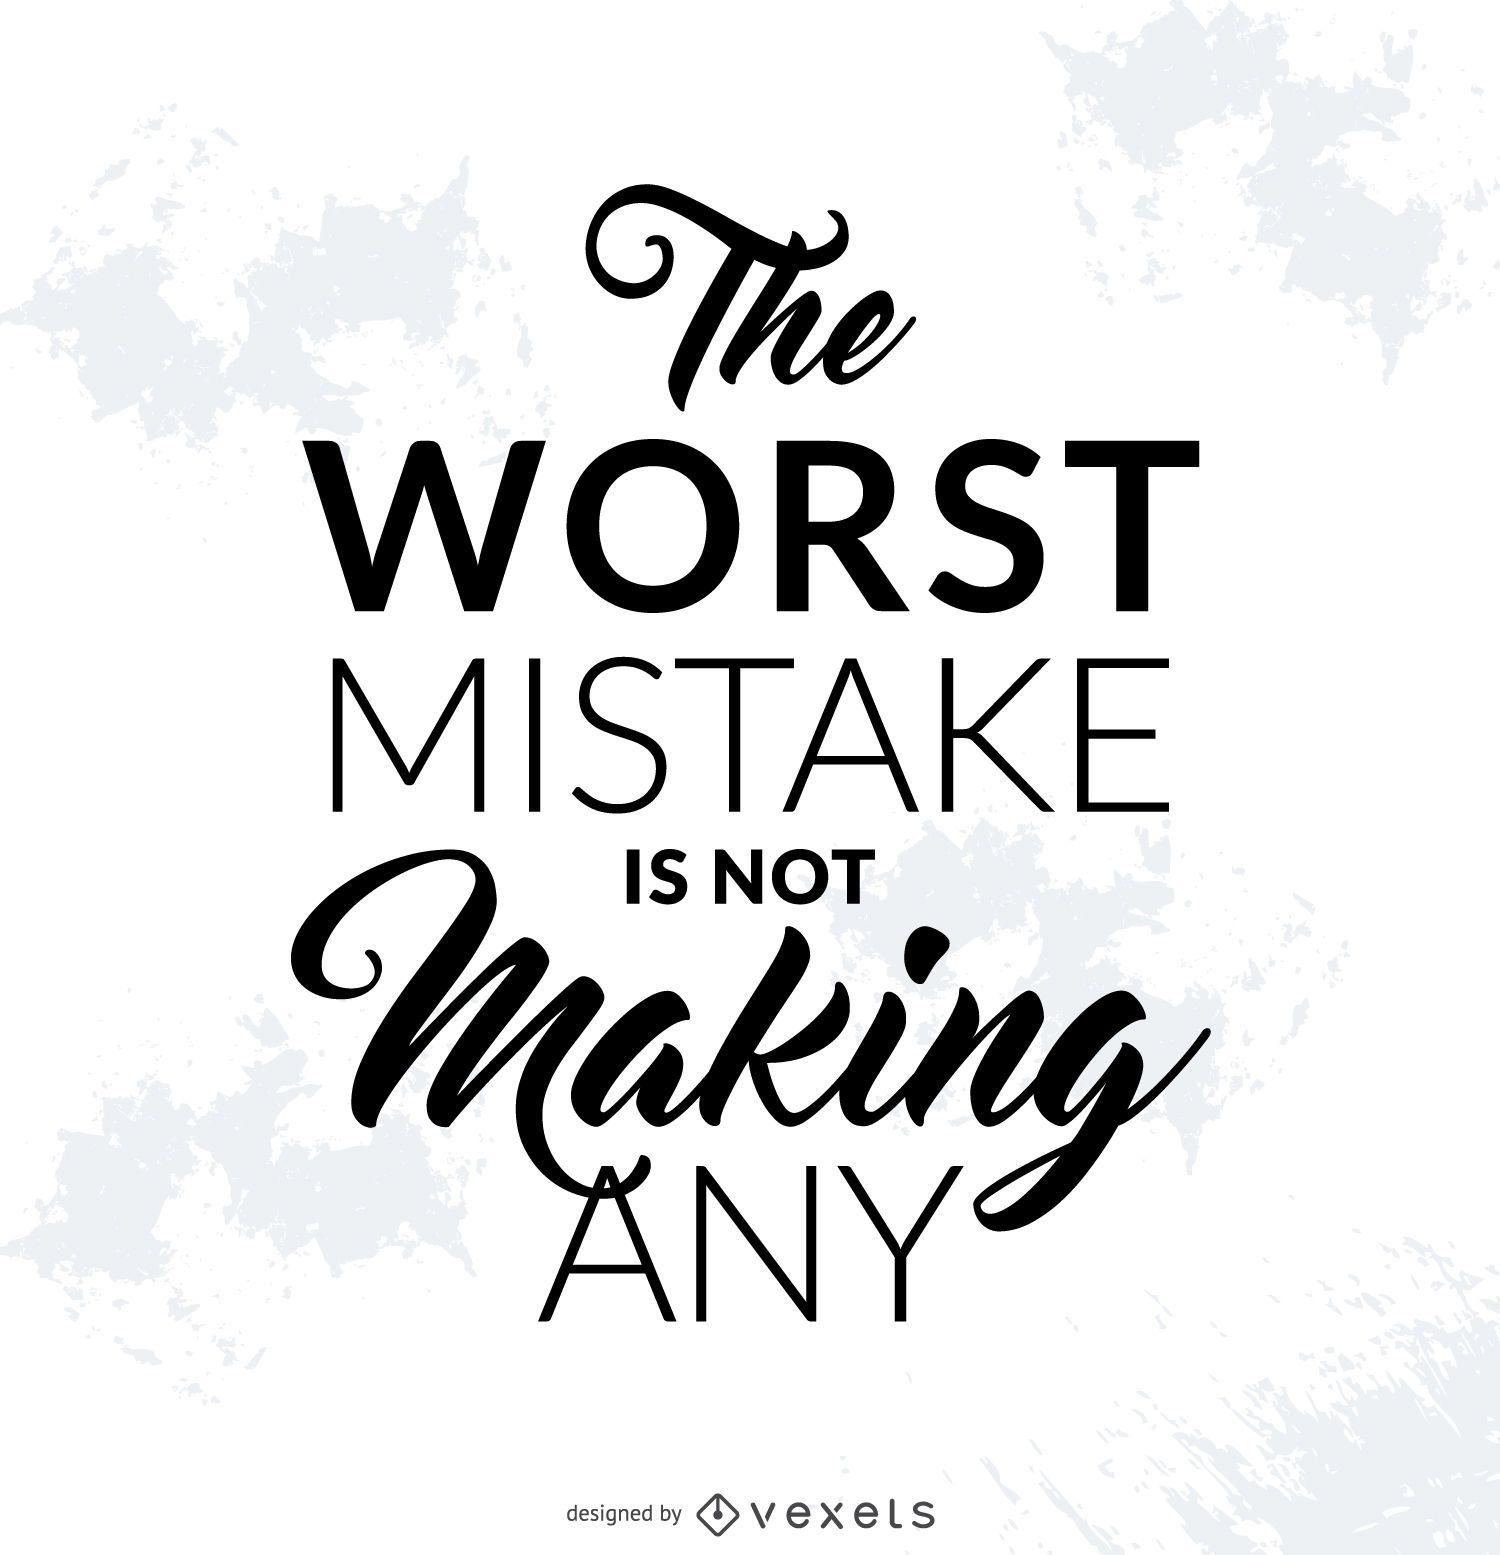 Pôster de erro motivacional